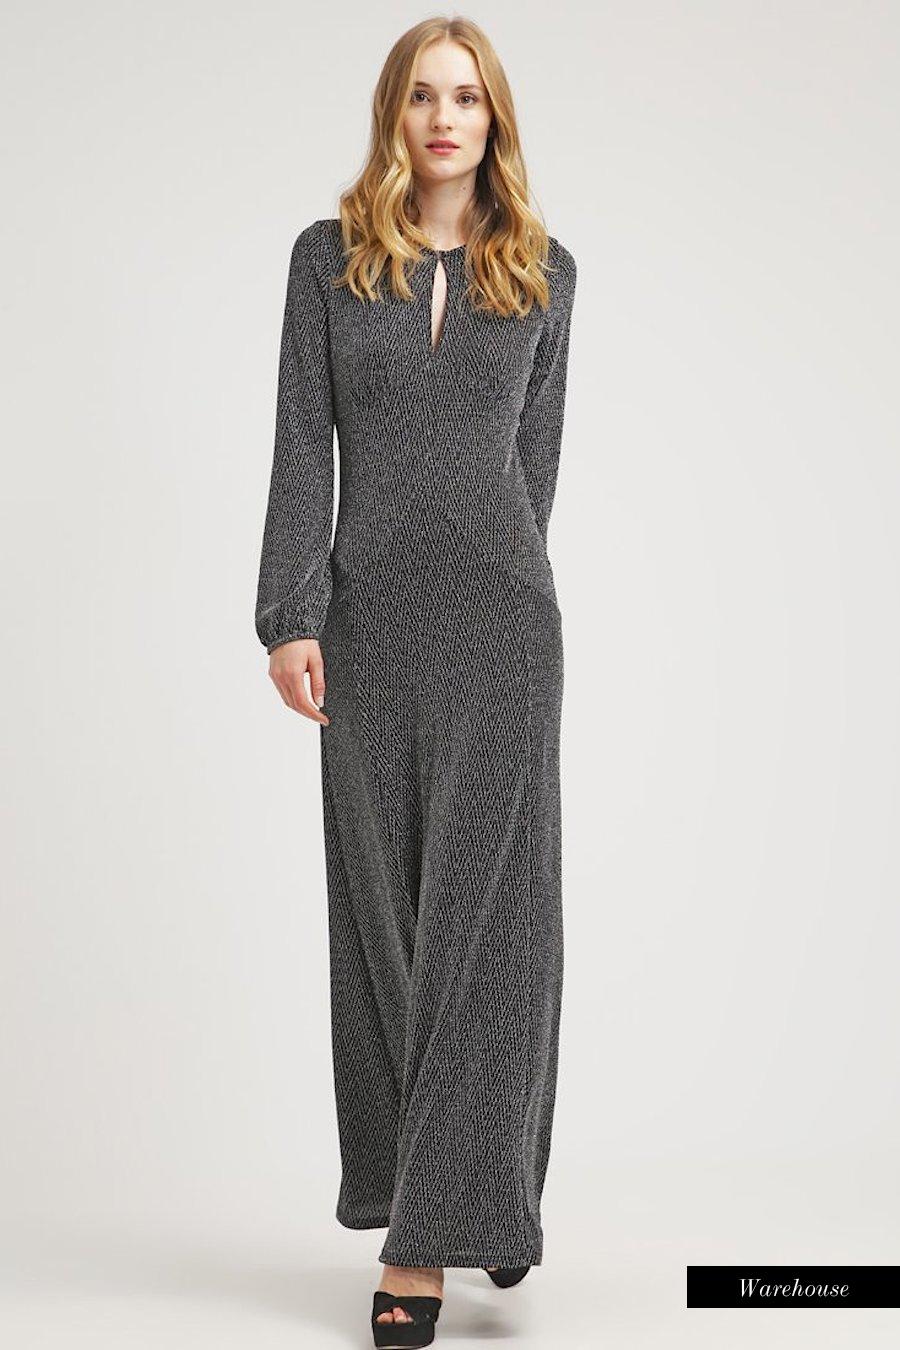 Maxi dress under 200 fash-n-chips.com 8